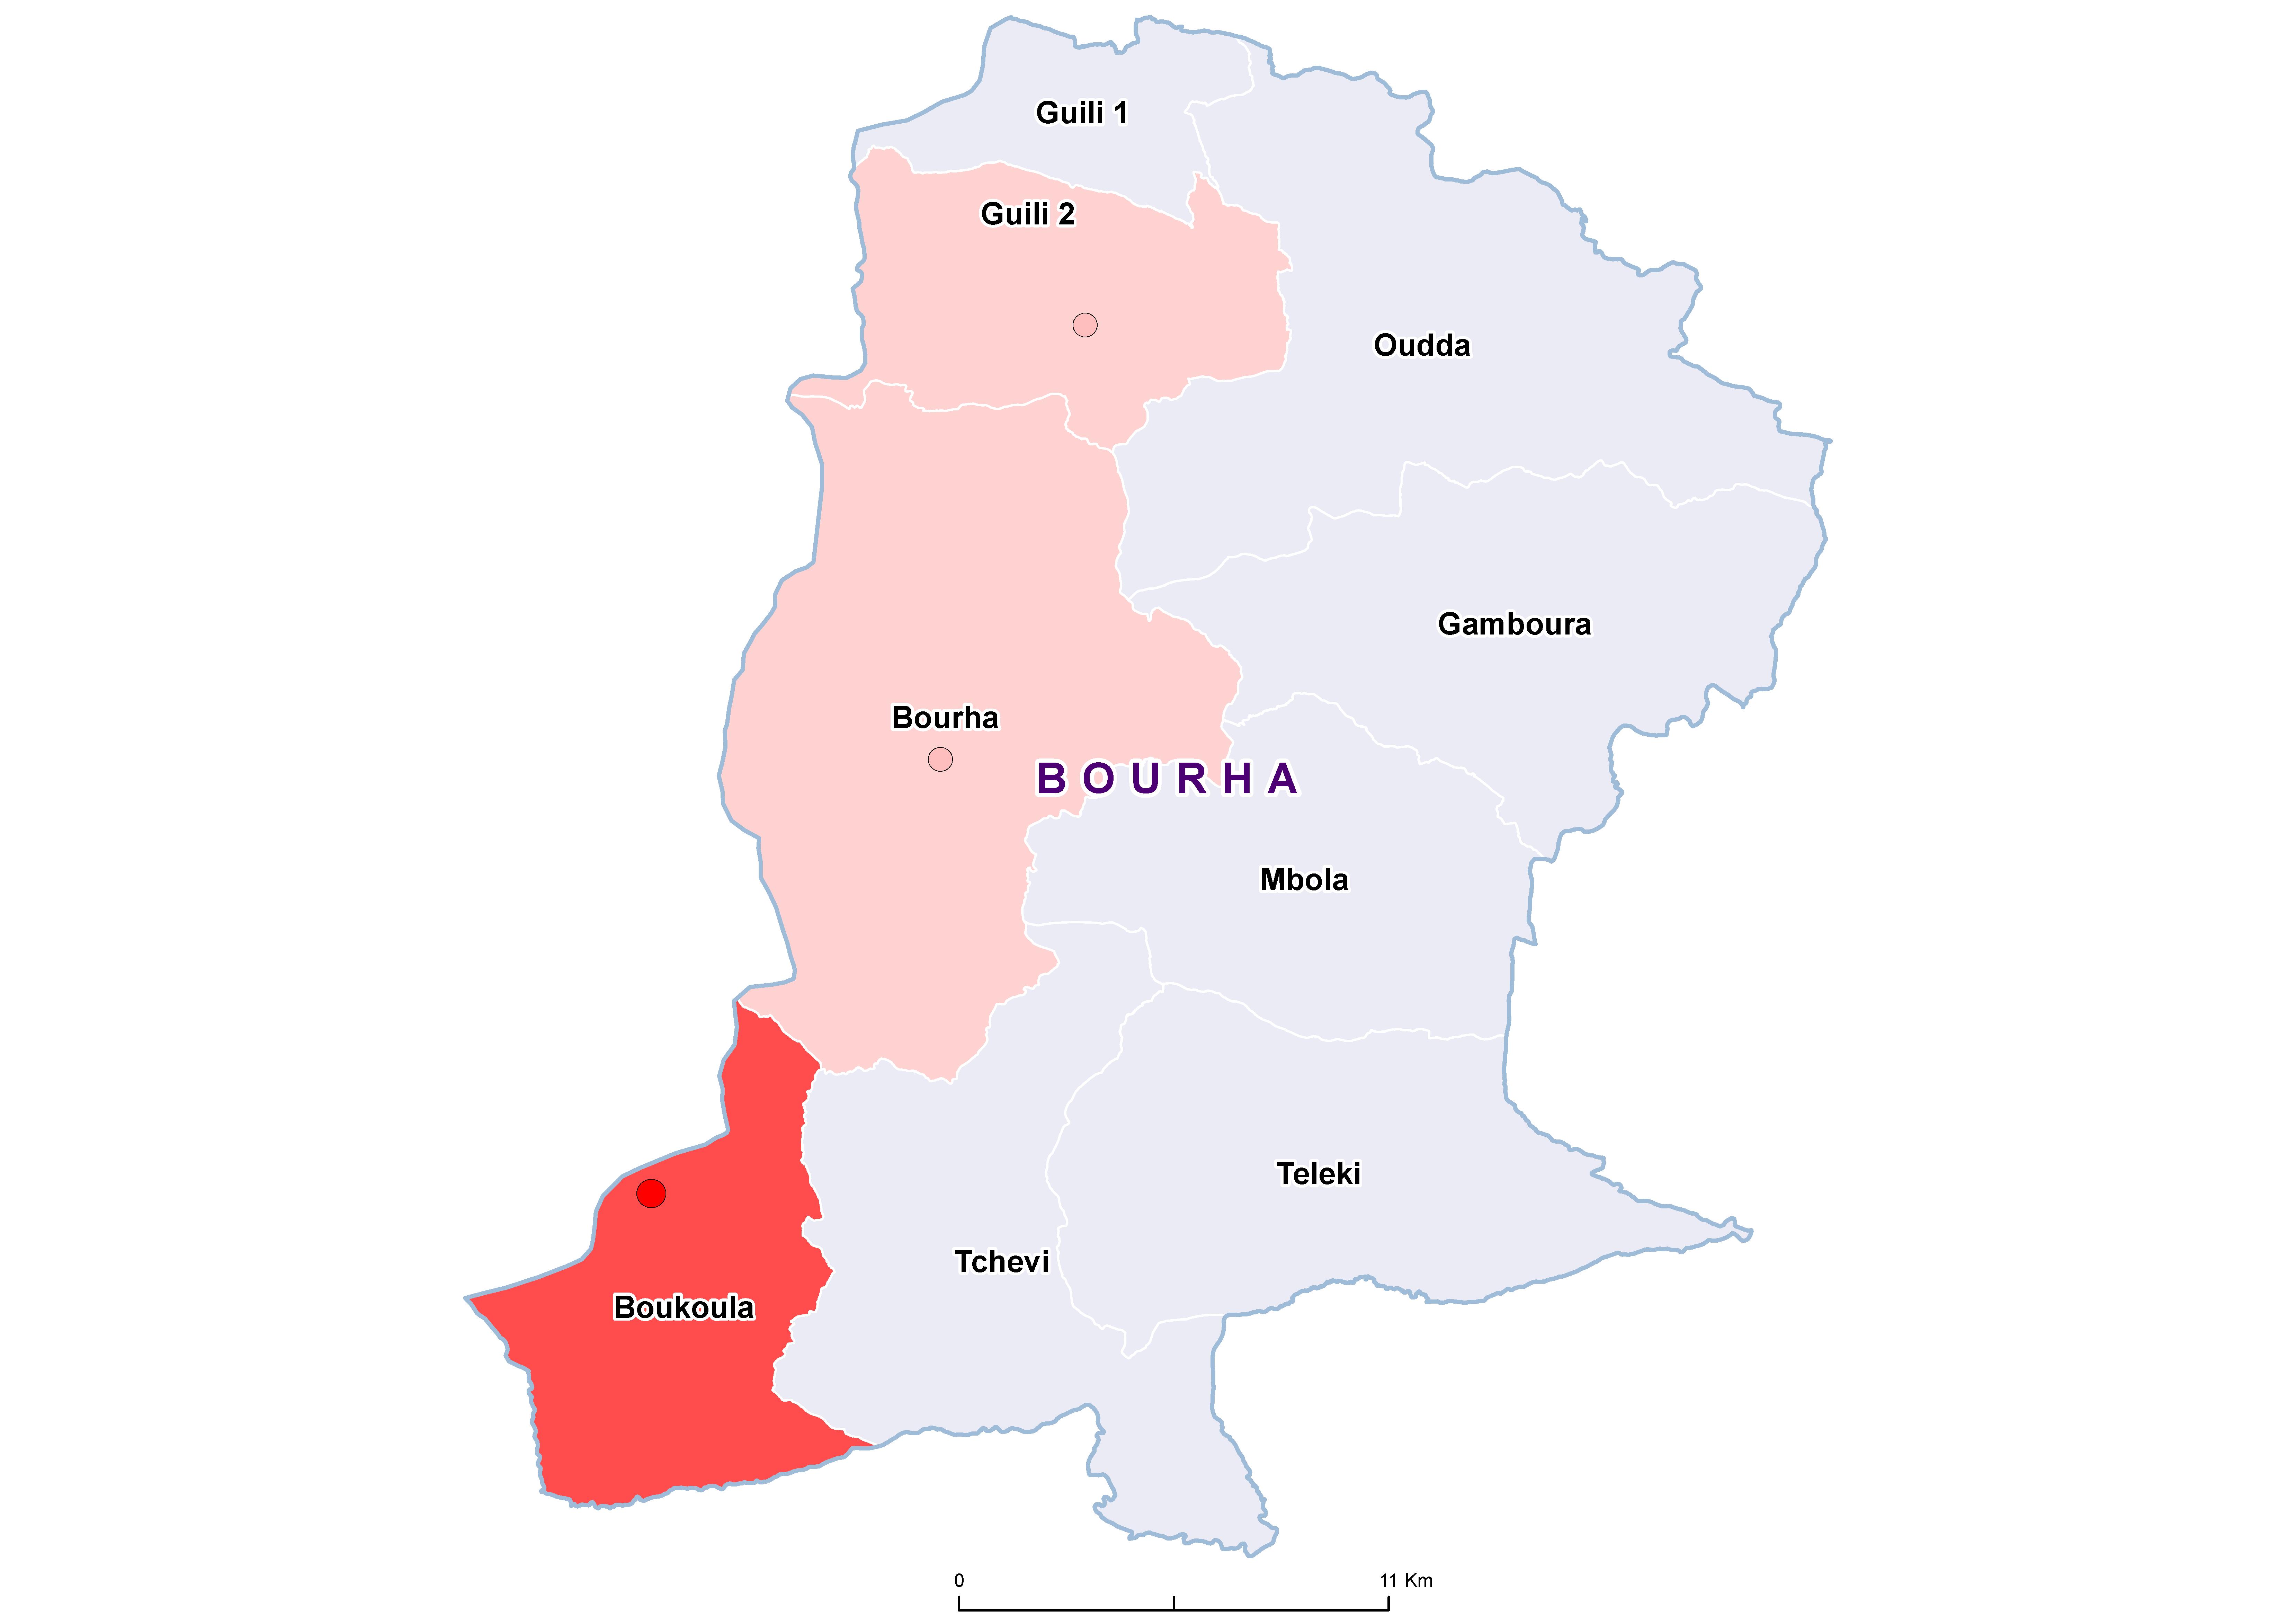 Bourha STH 19850001